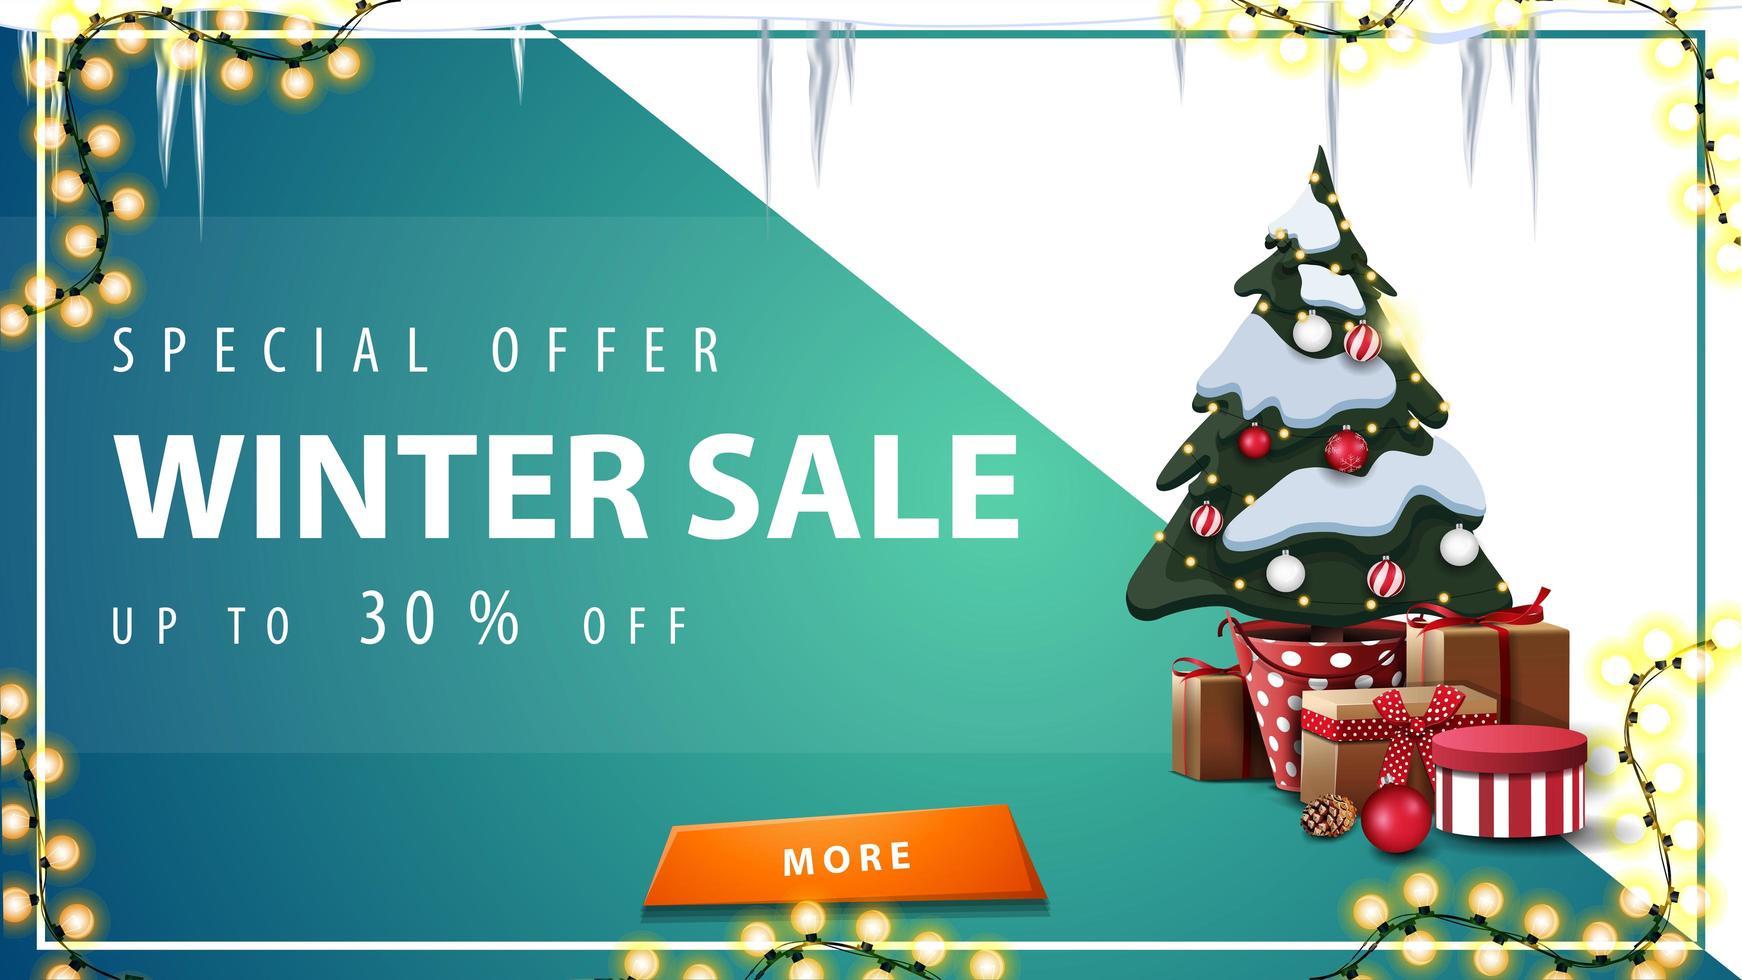 Winter sale, discount banner with orange button vector